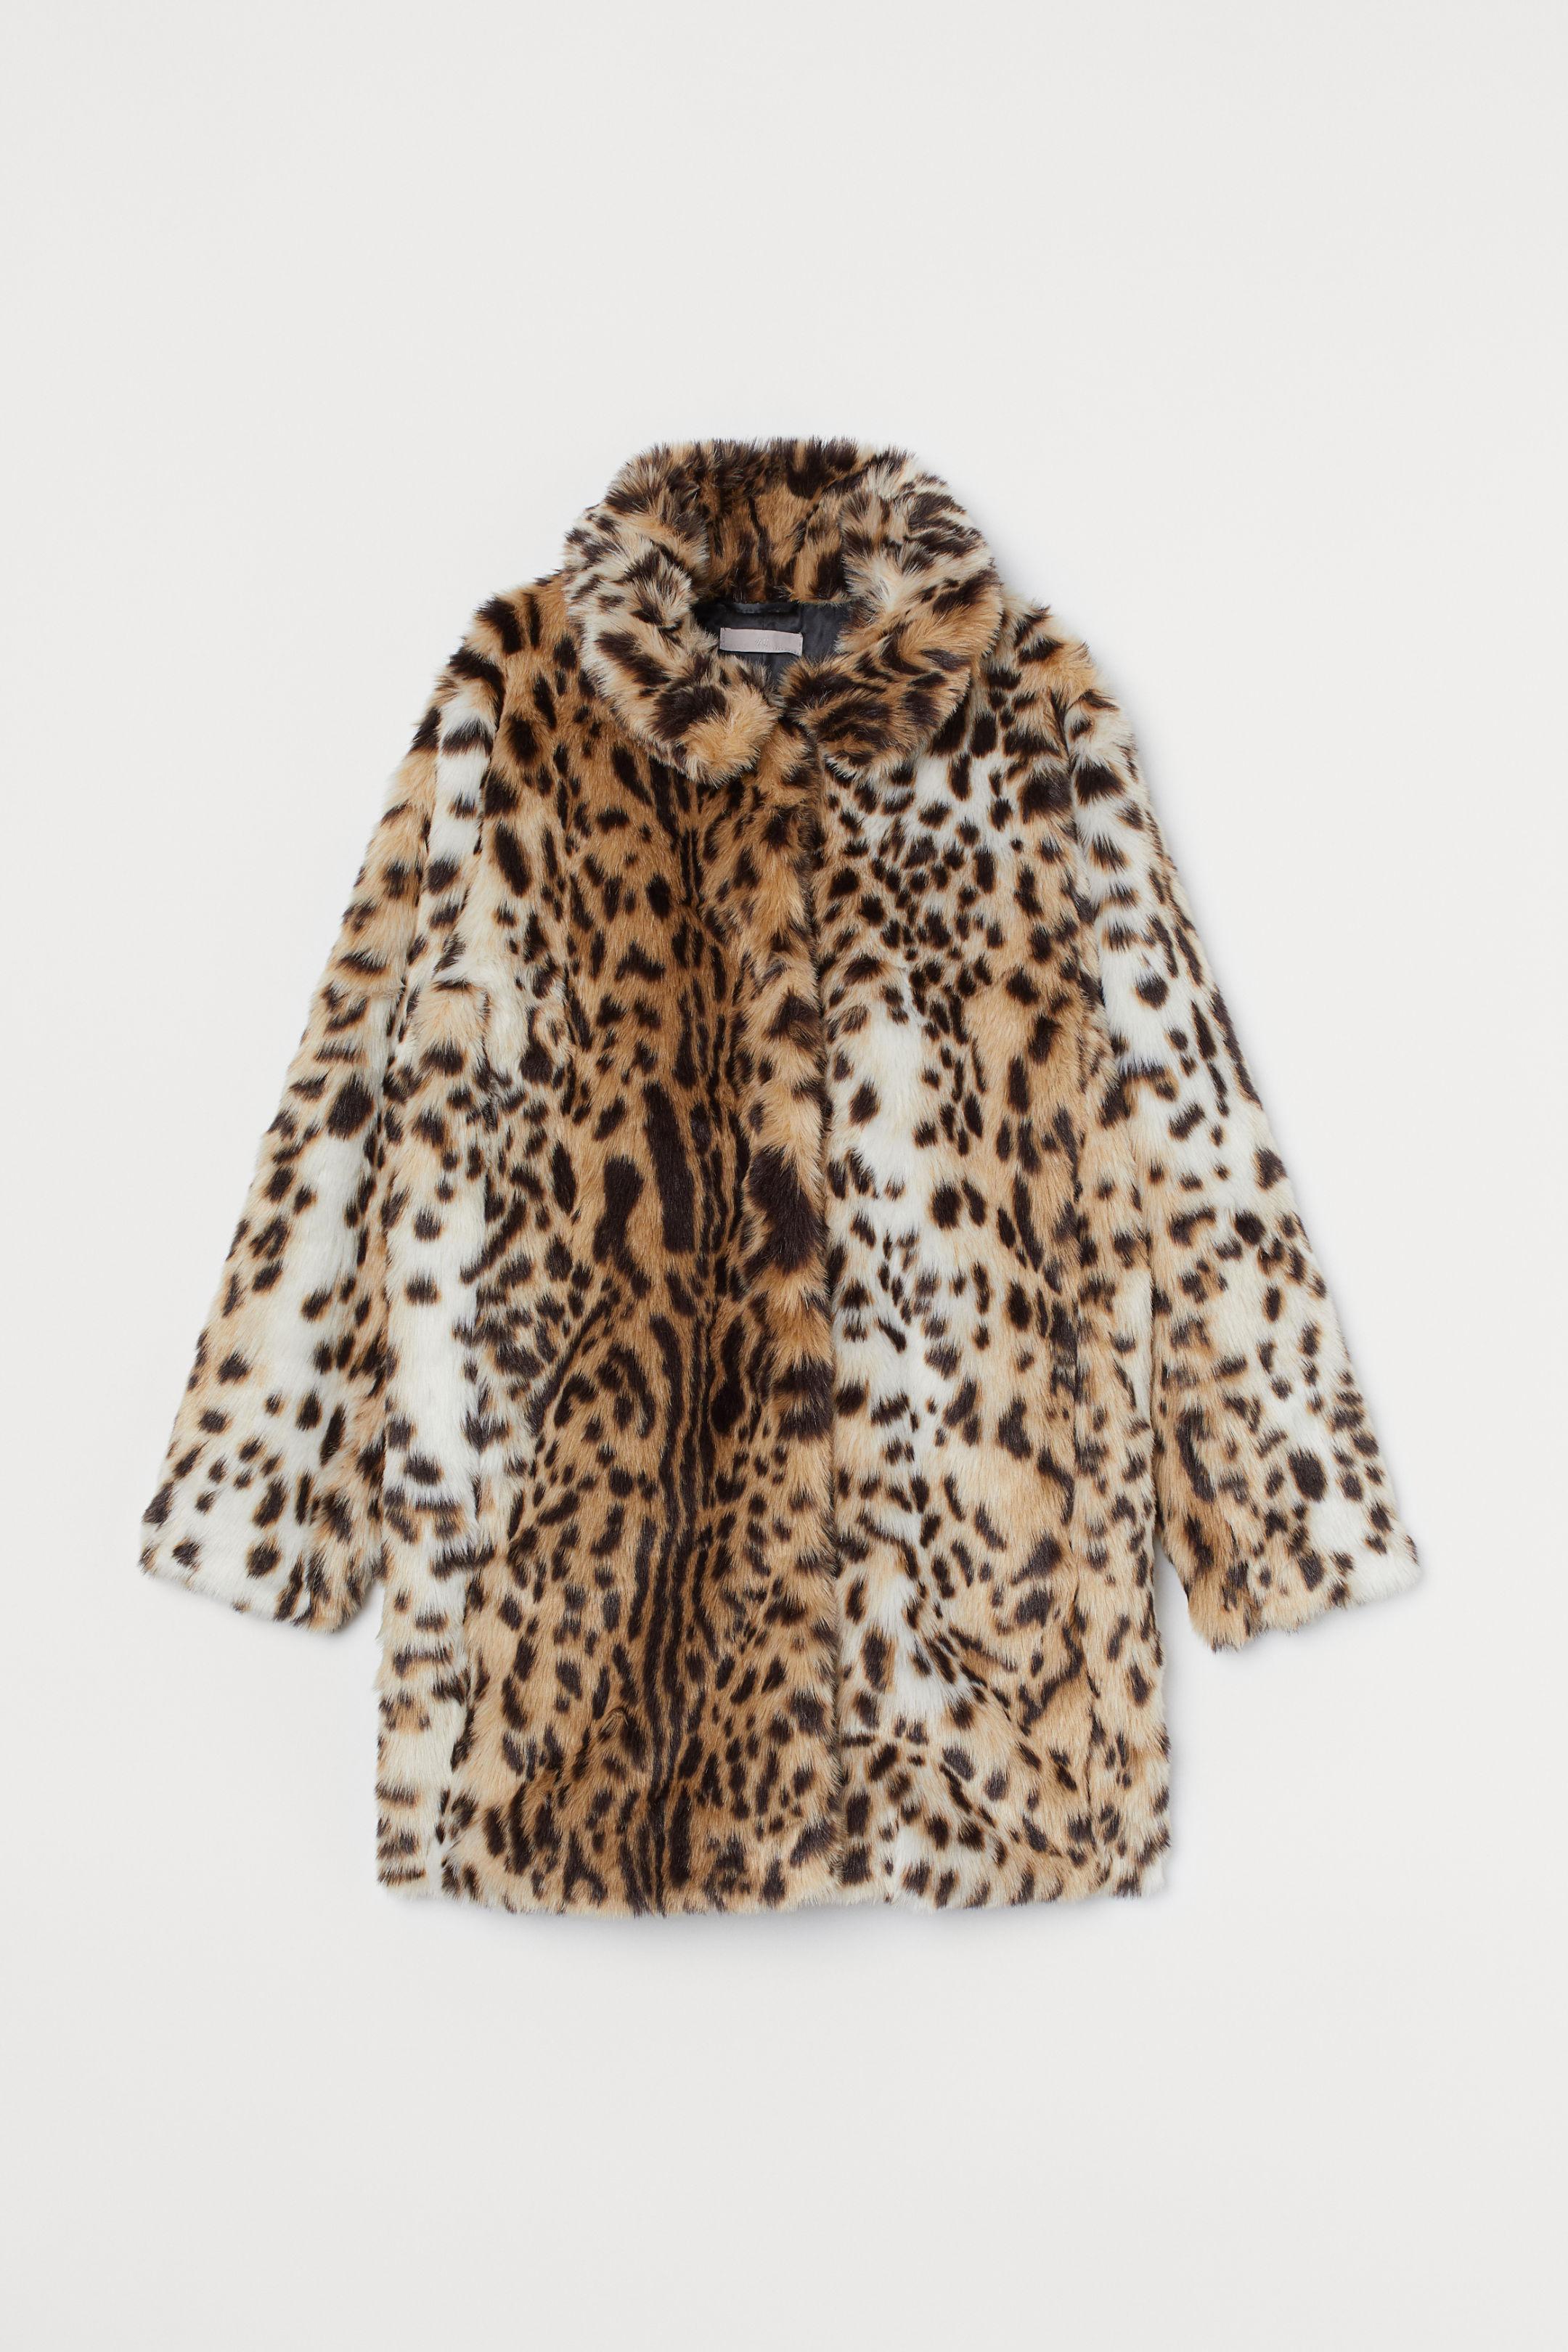 leopard print jacket coat H&M